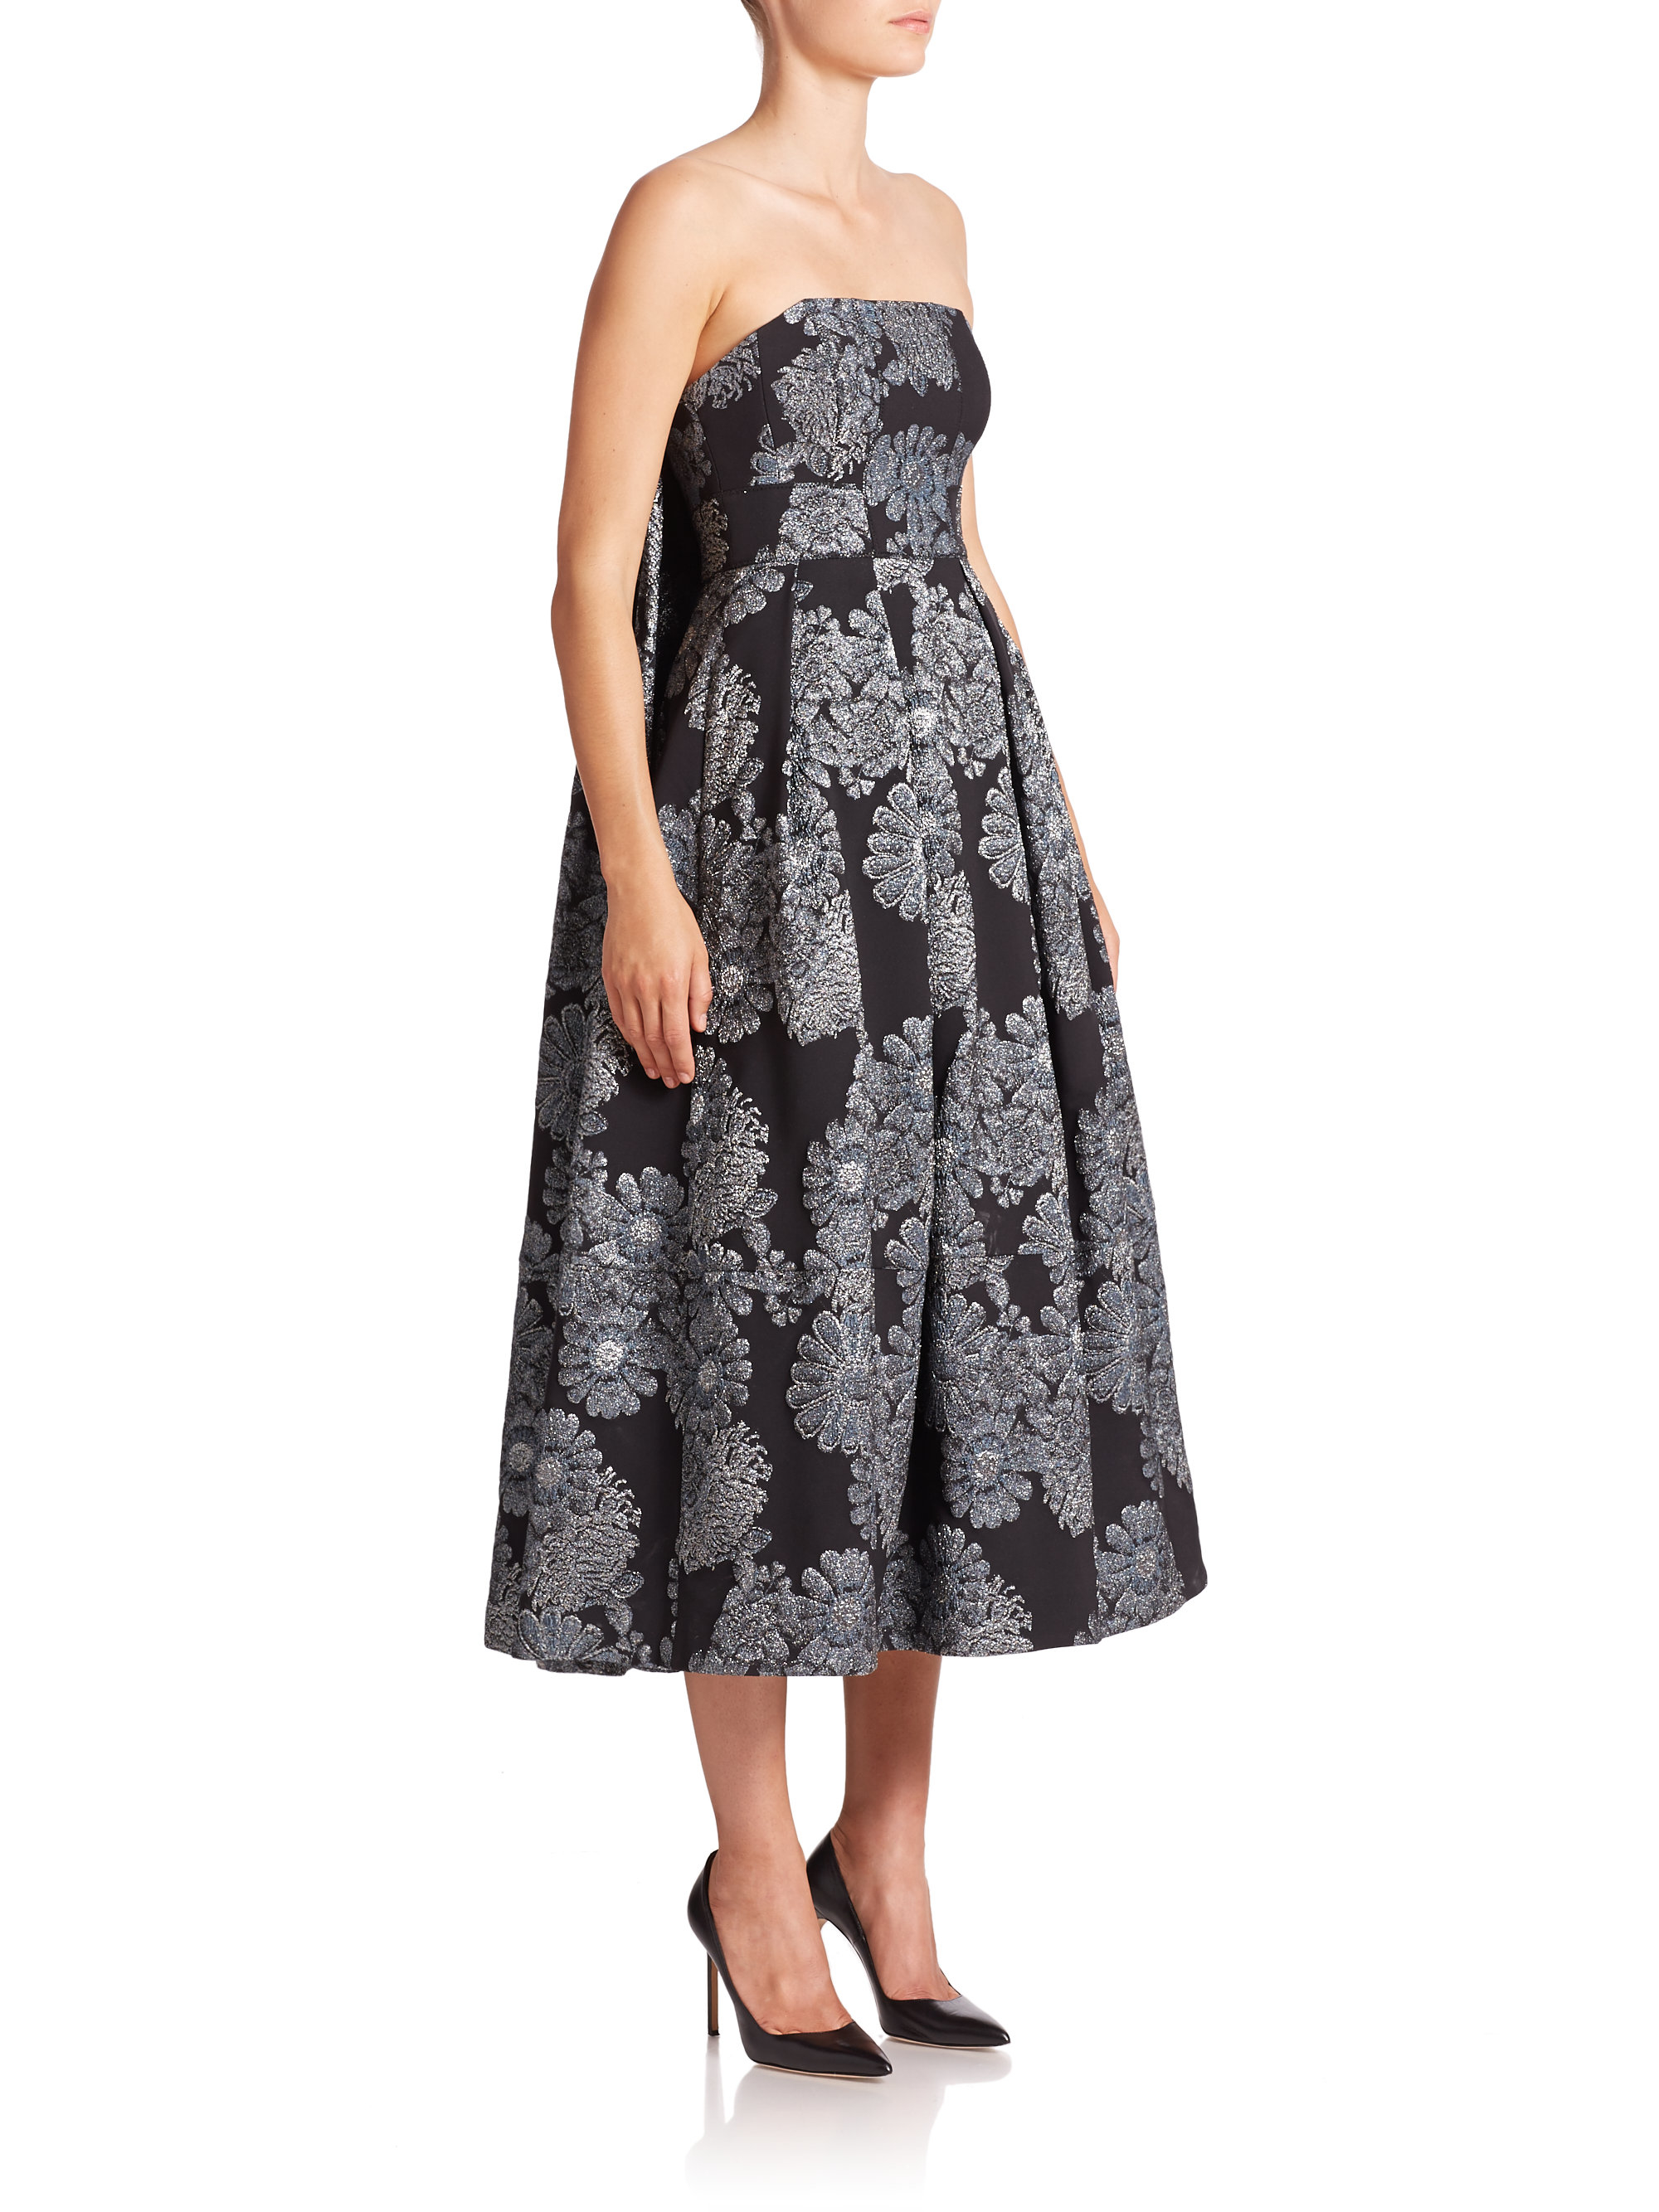 Long sleeve cocktail dresses alina